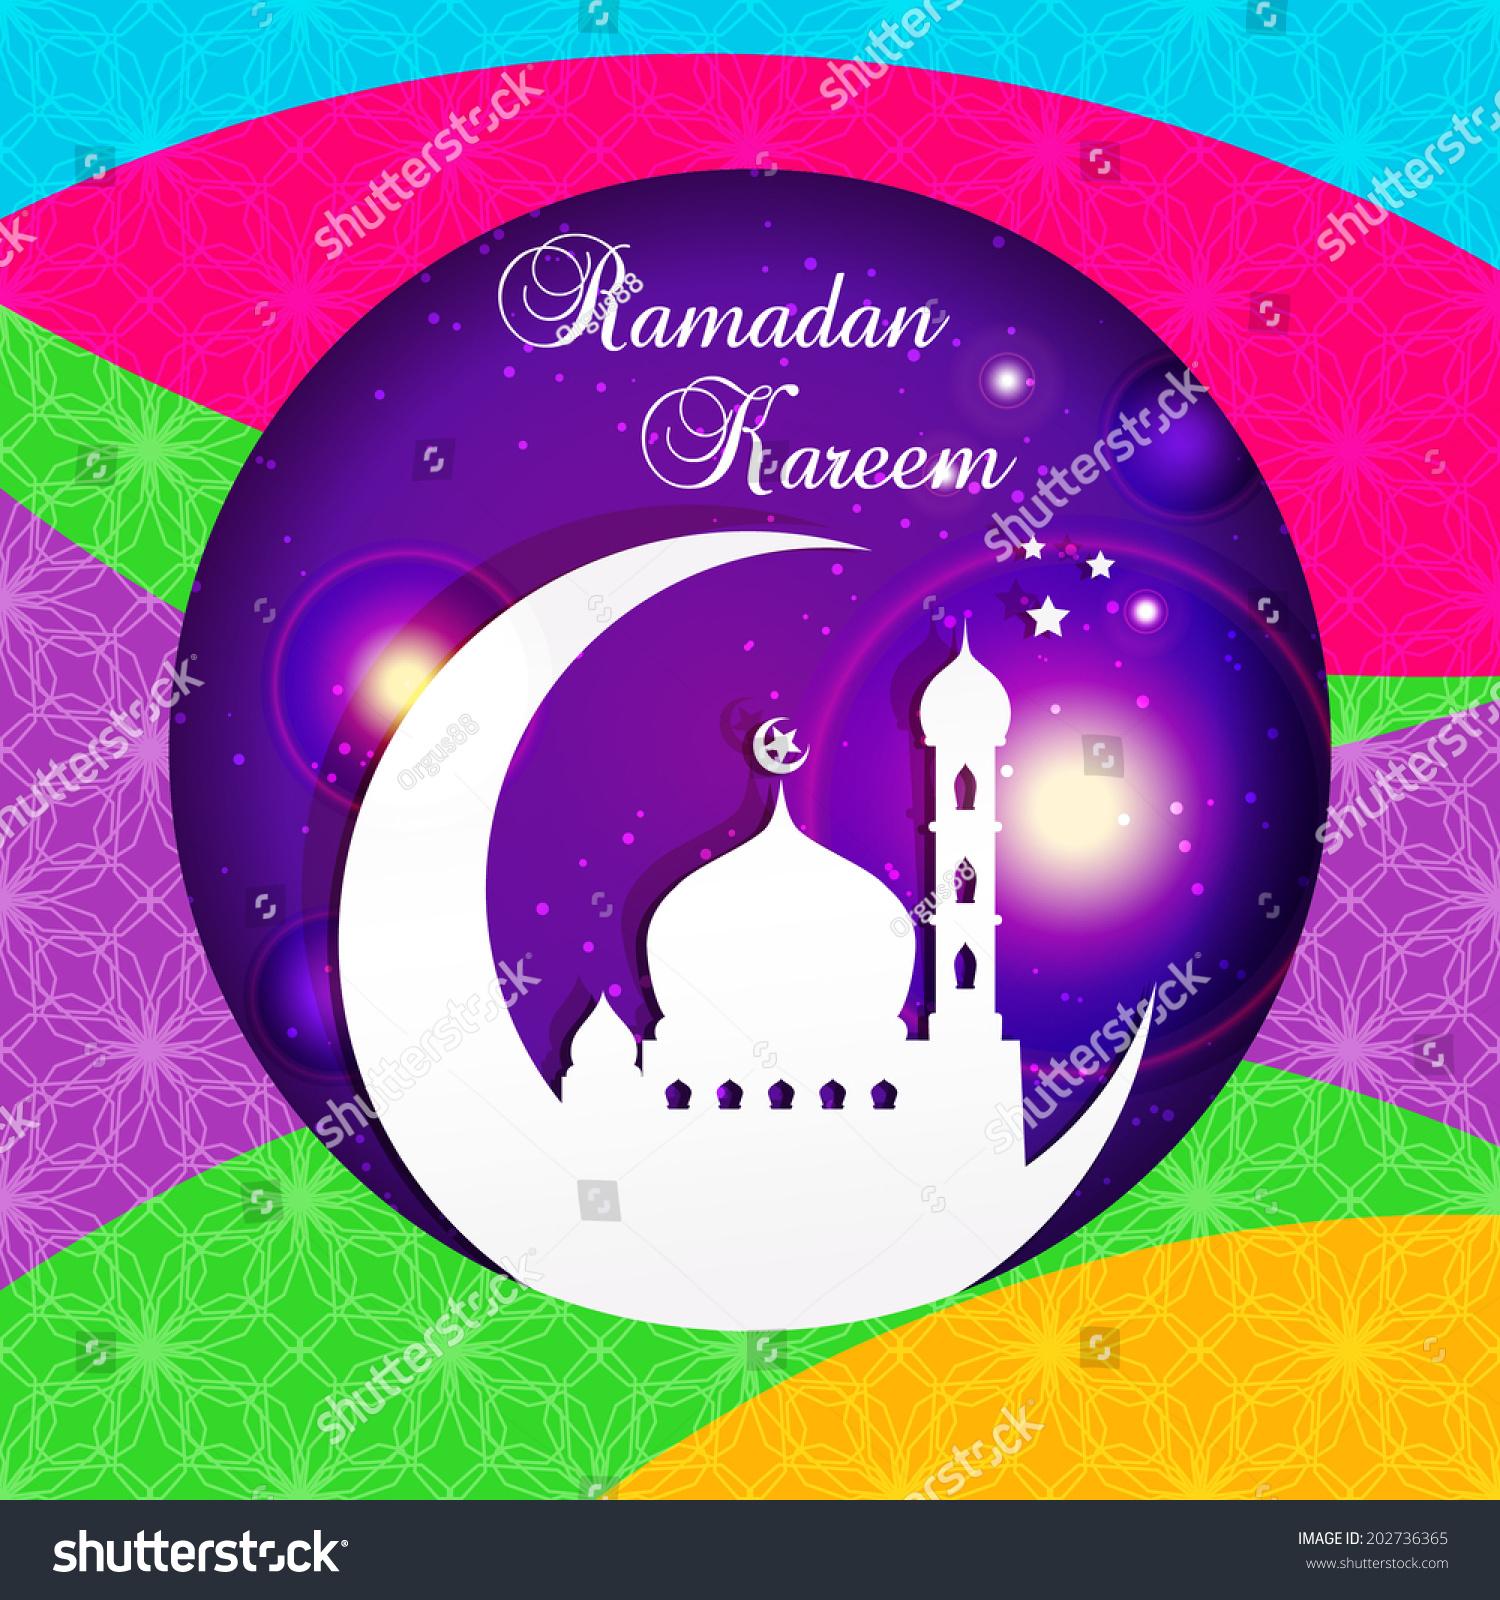 Ramadan kareem greeting card vector template stock vector 202736365 ramadan kareem greeting card vector template greeting card with mosque and crescent moon paper kristyandbryce Image collections